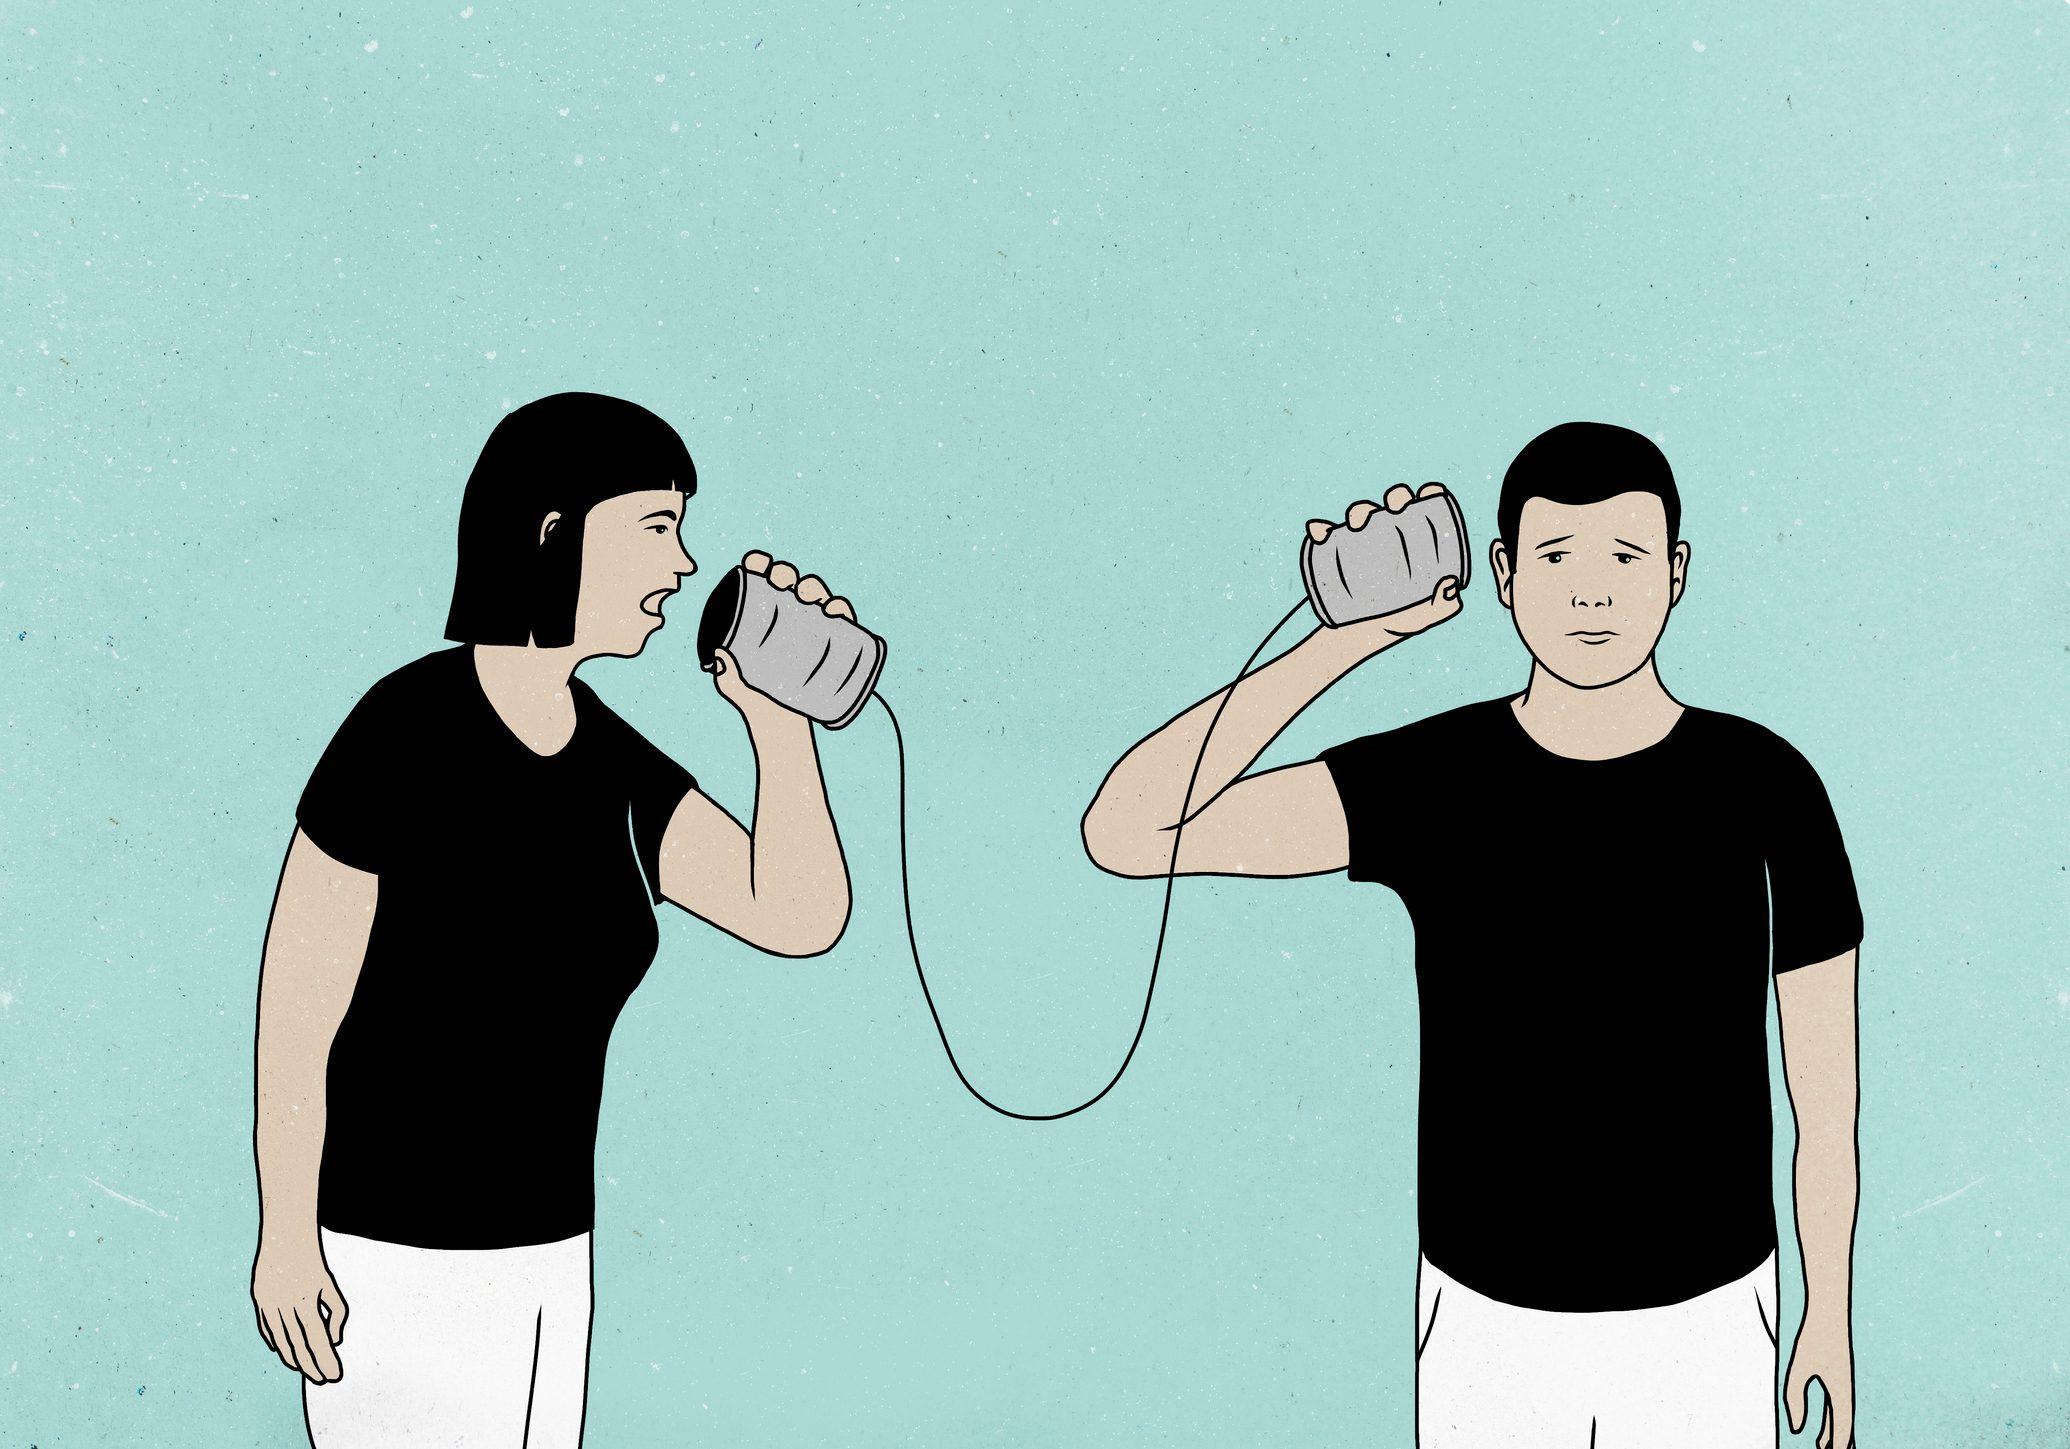 couple communicating through tin cans illustration